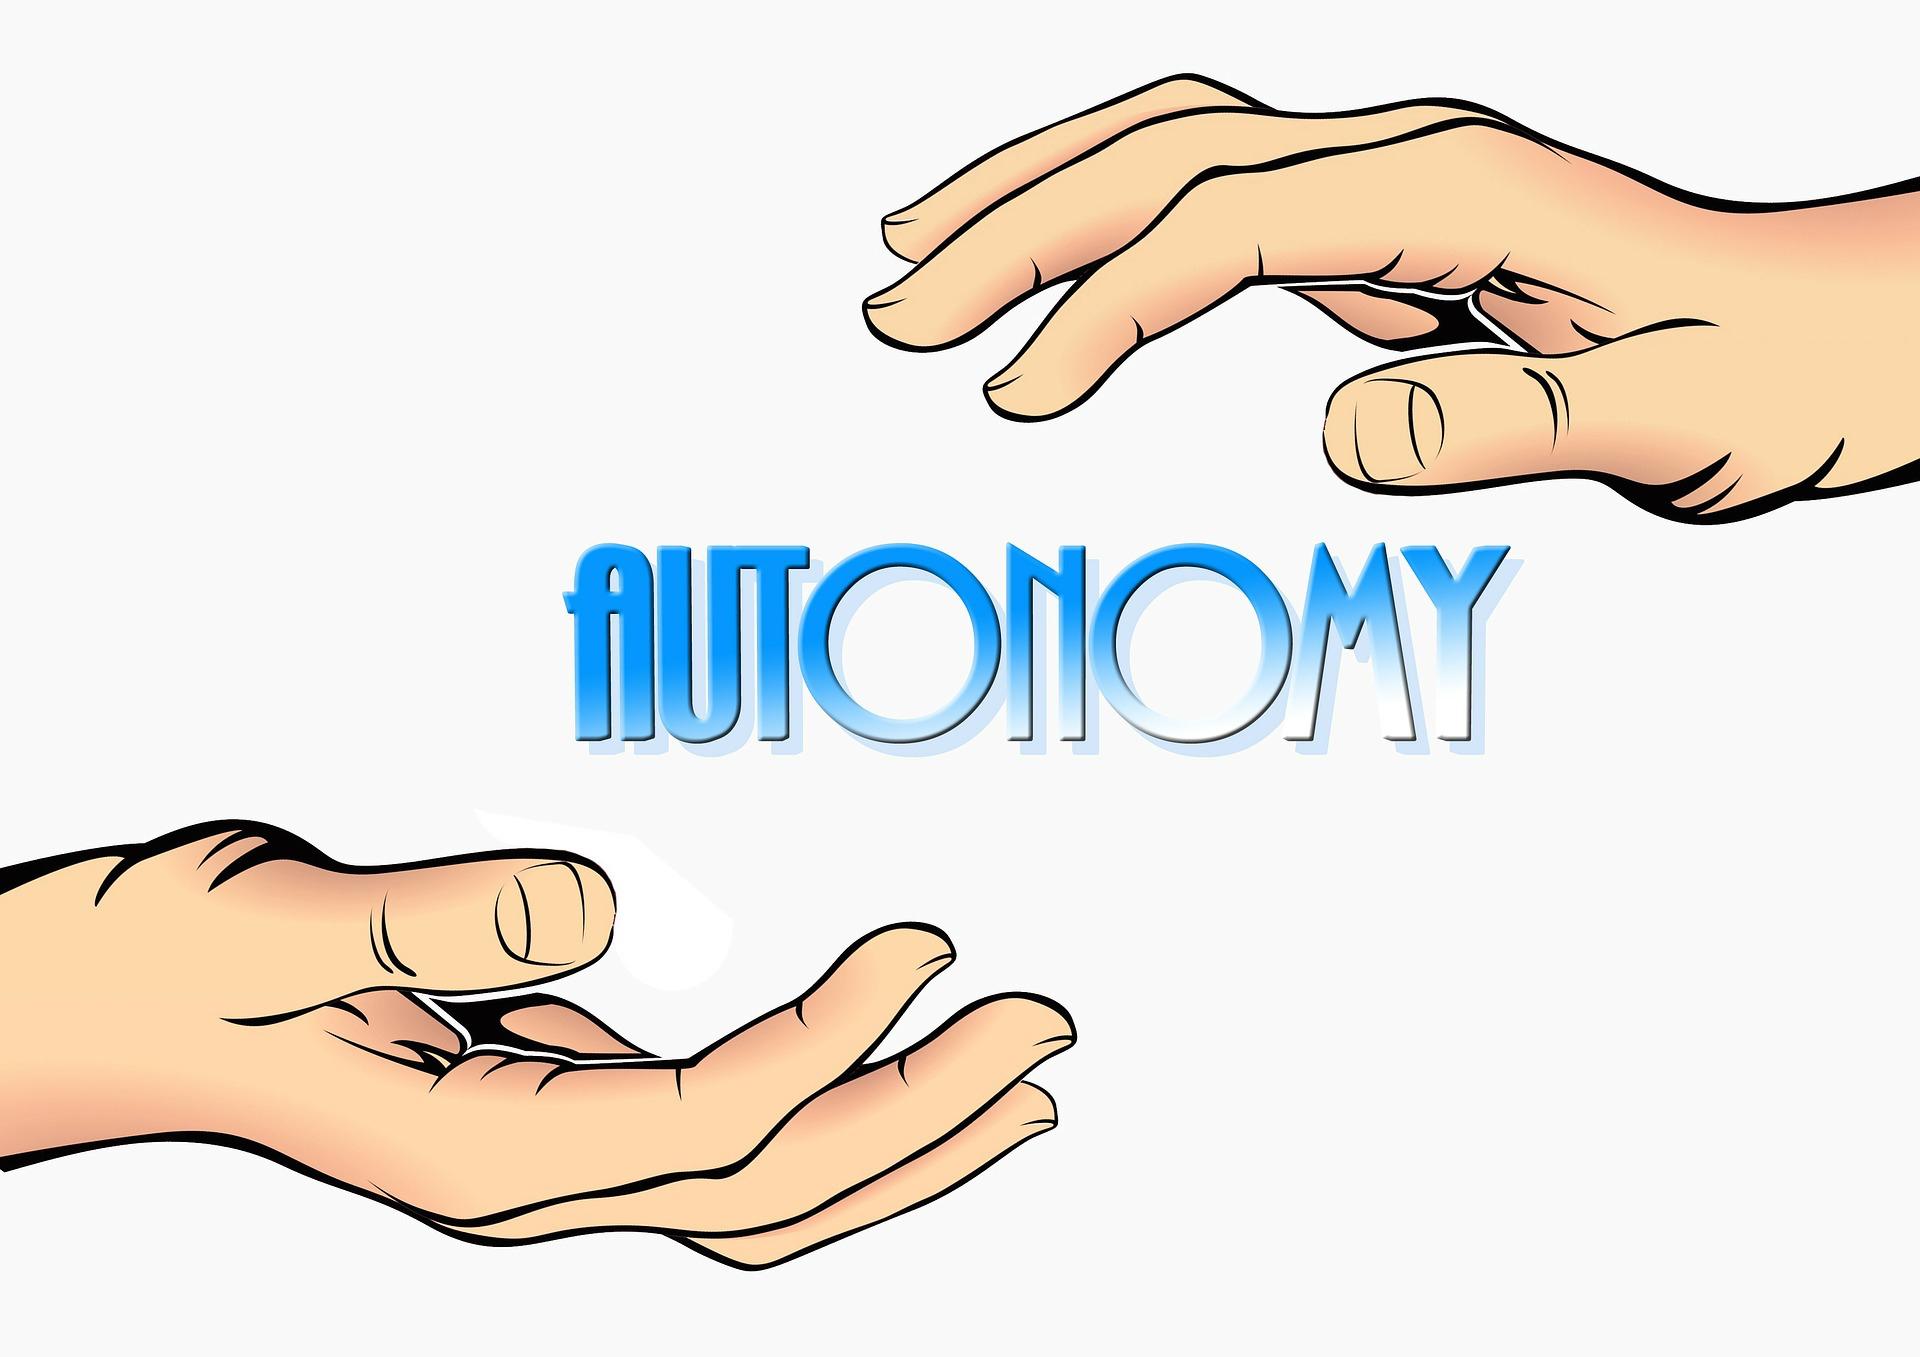 autonomy-298474_1920_geralt